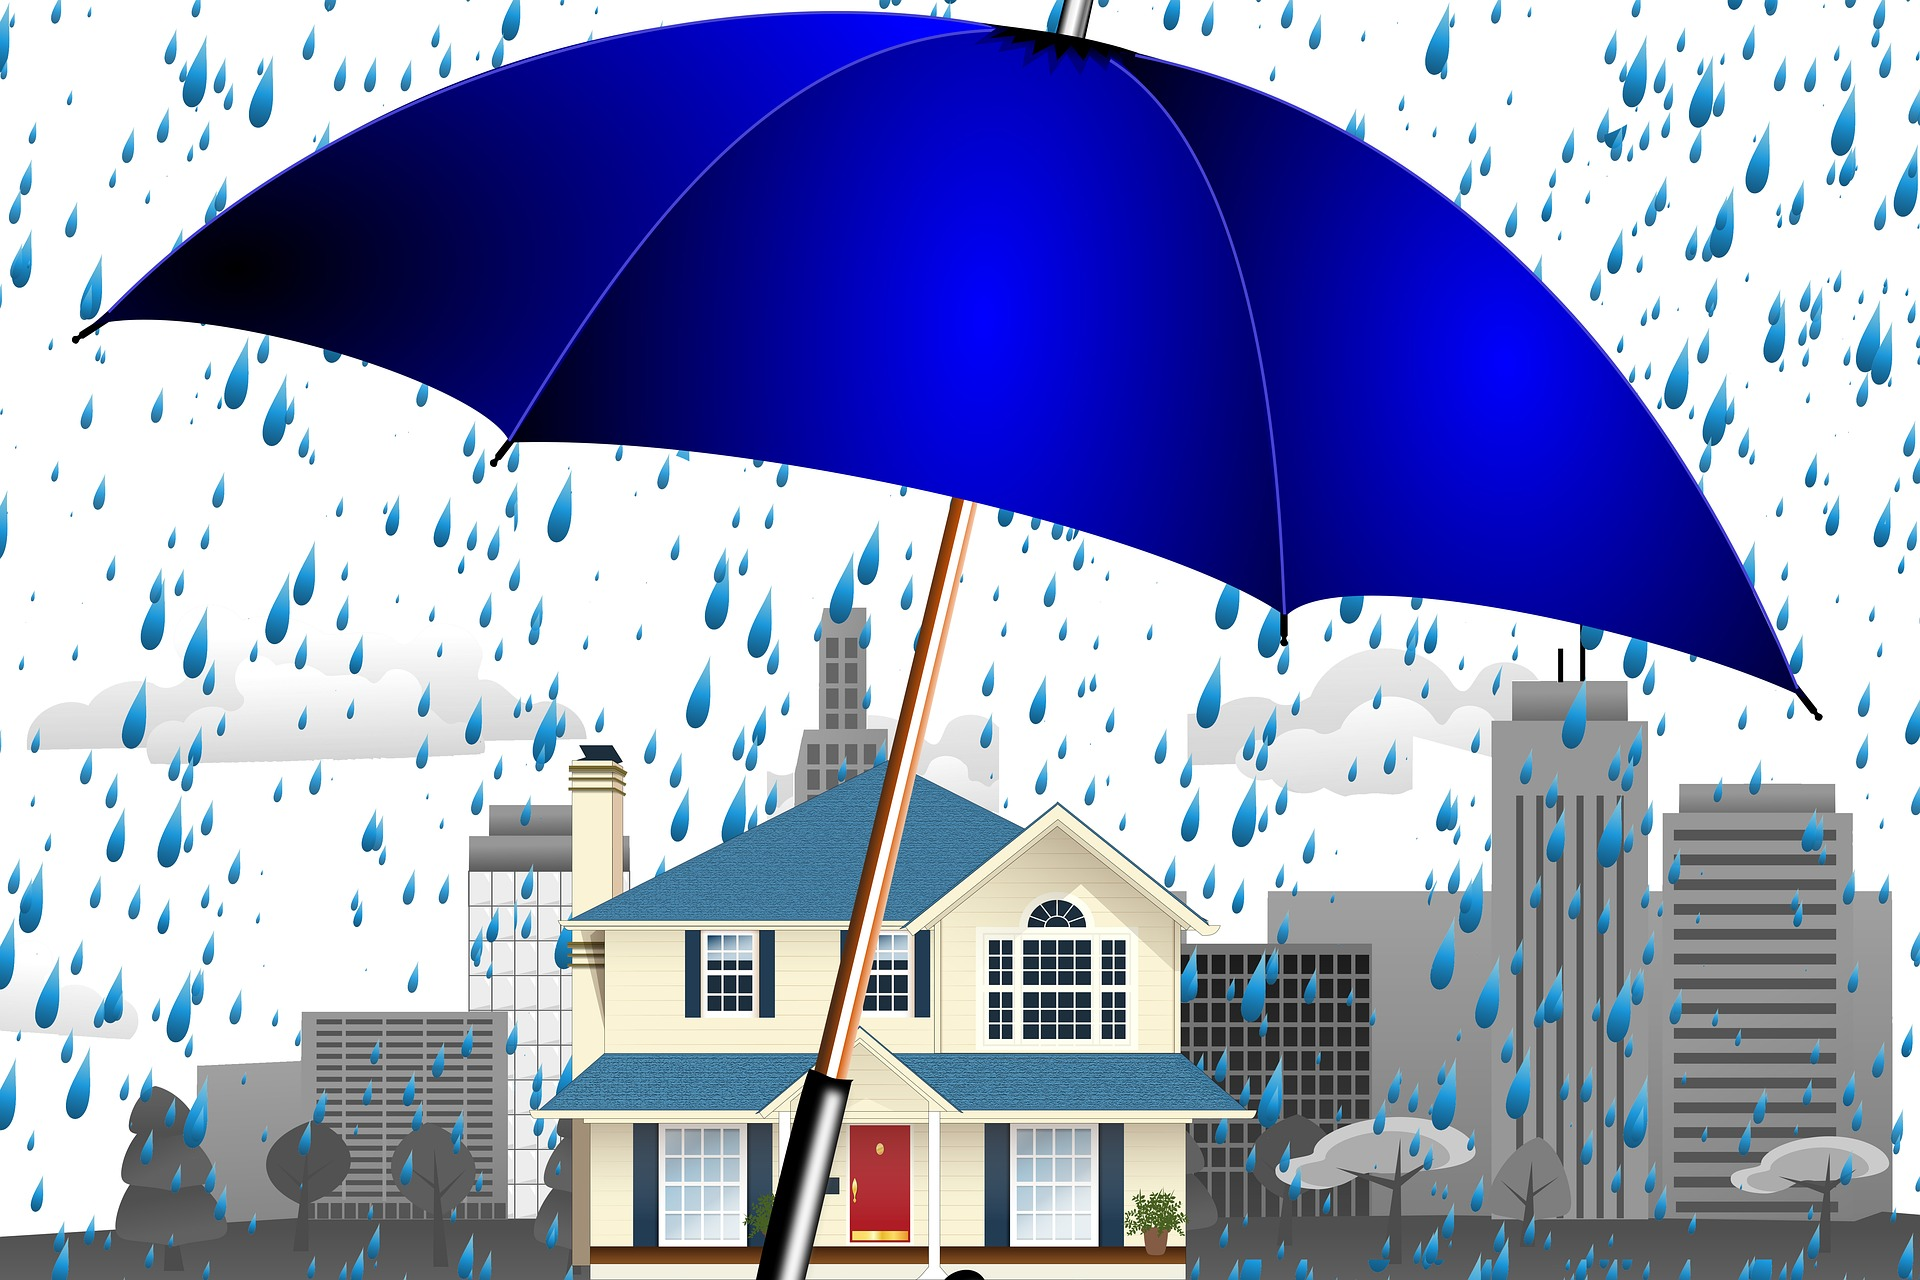 Shropshire Property Market Update - Spring 2020